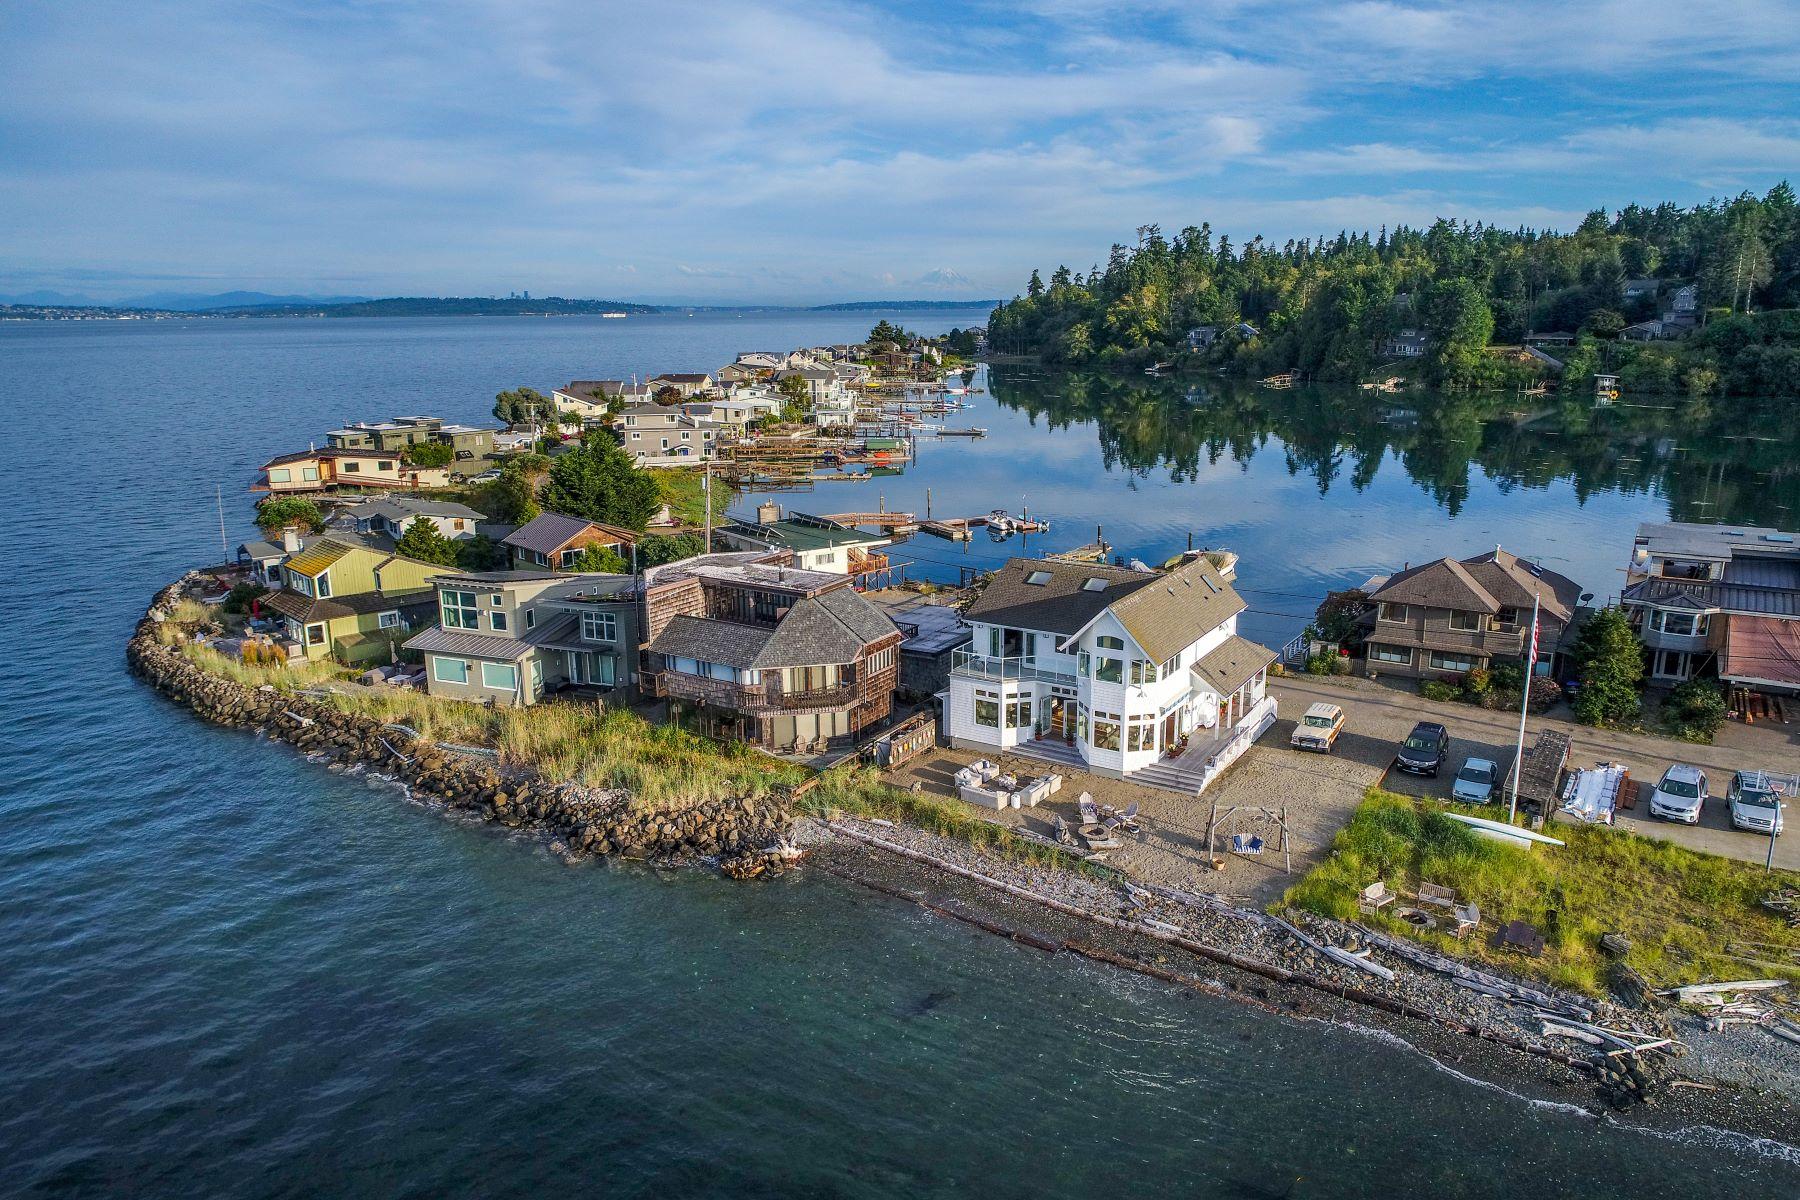 Single Family Homes for Sale at 15712 Point Monroe Drive NE, Bainbridge Island, WA 98110 15712 Point Monroe Drive NE Bainbridge Island, Washington 98110 United States